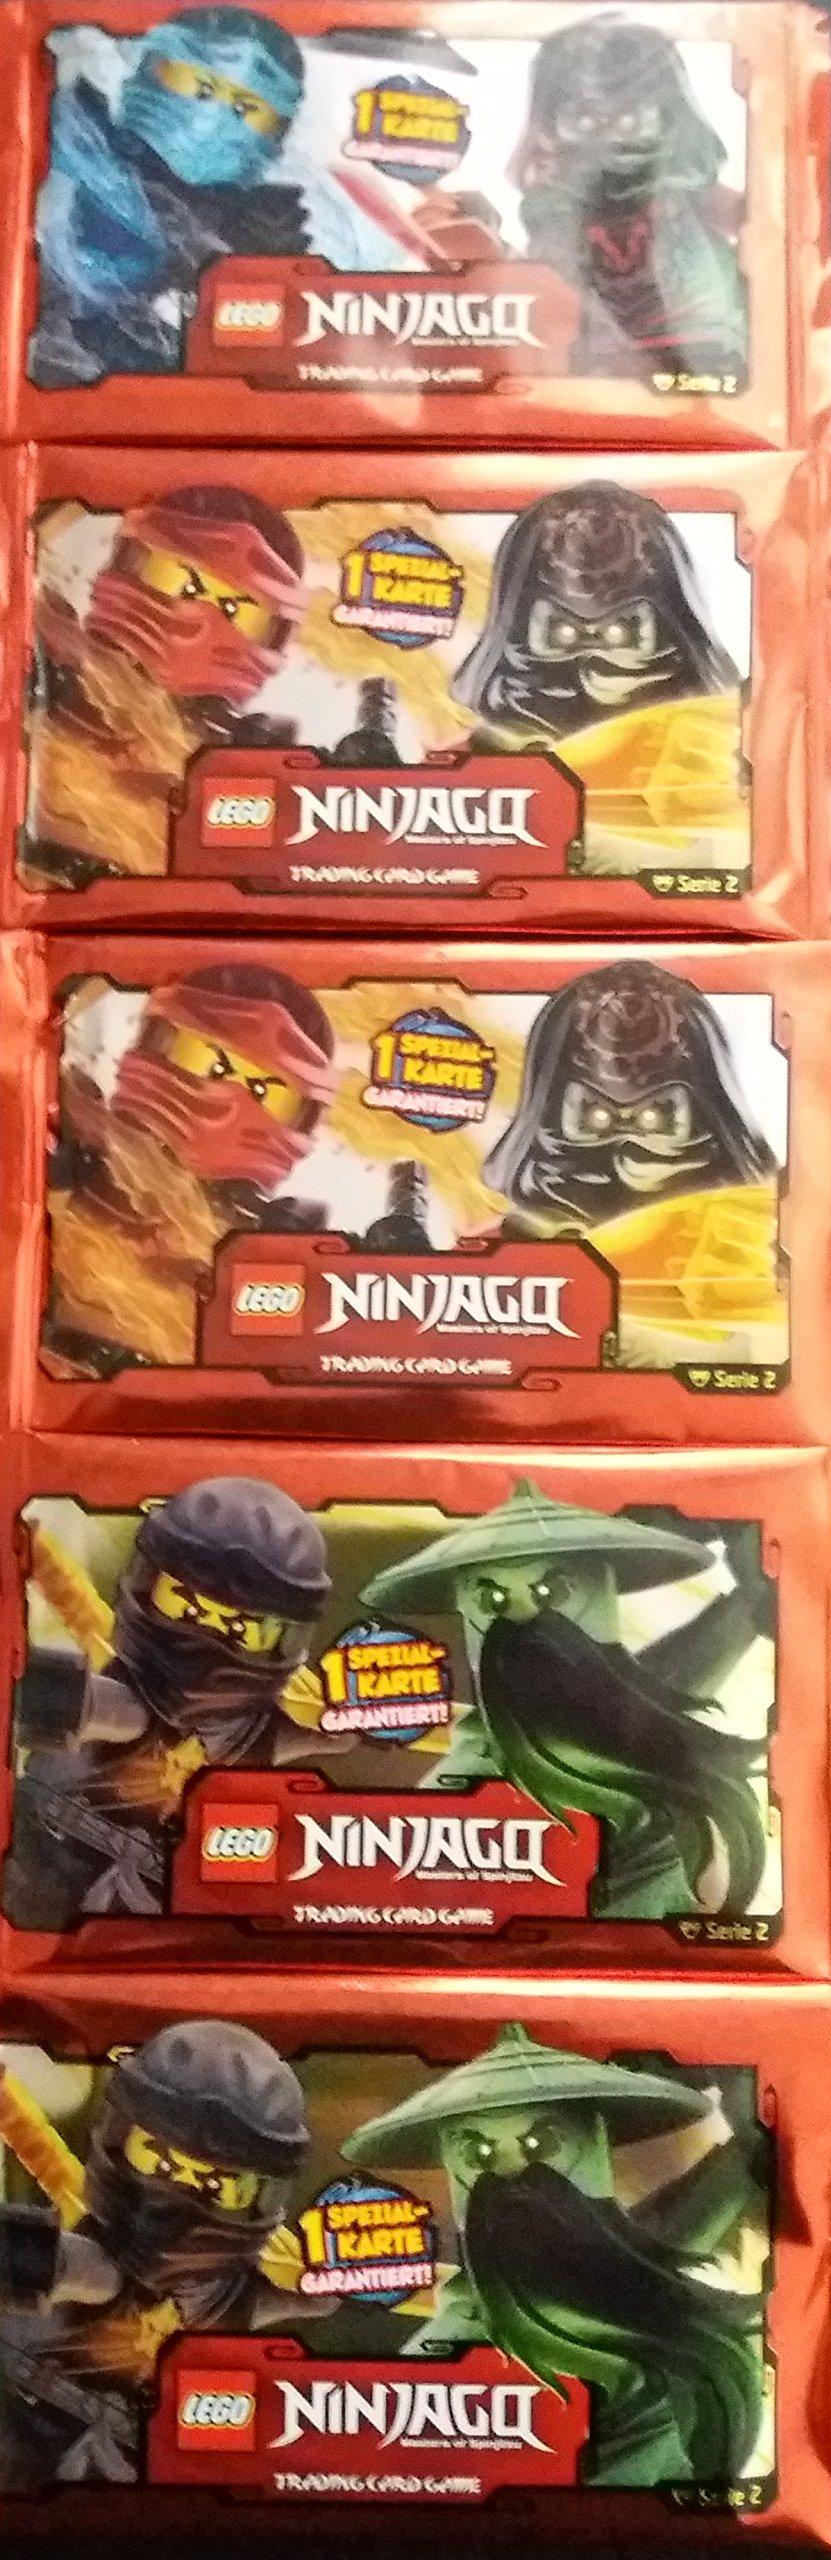 5 Booster LEGO Ninjago Cards Serie 2 - 5 Pack á 5 Trading cards